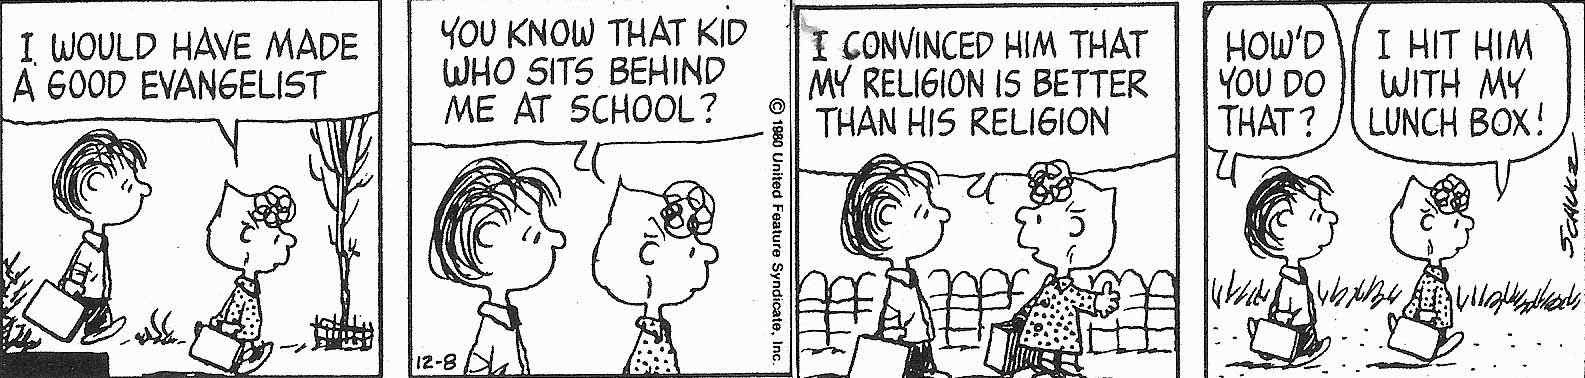 Funny Good Religious Evangelist Cartoon Joke Picture